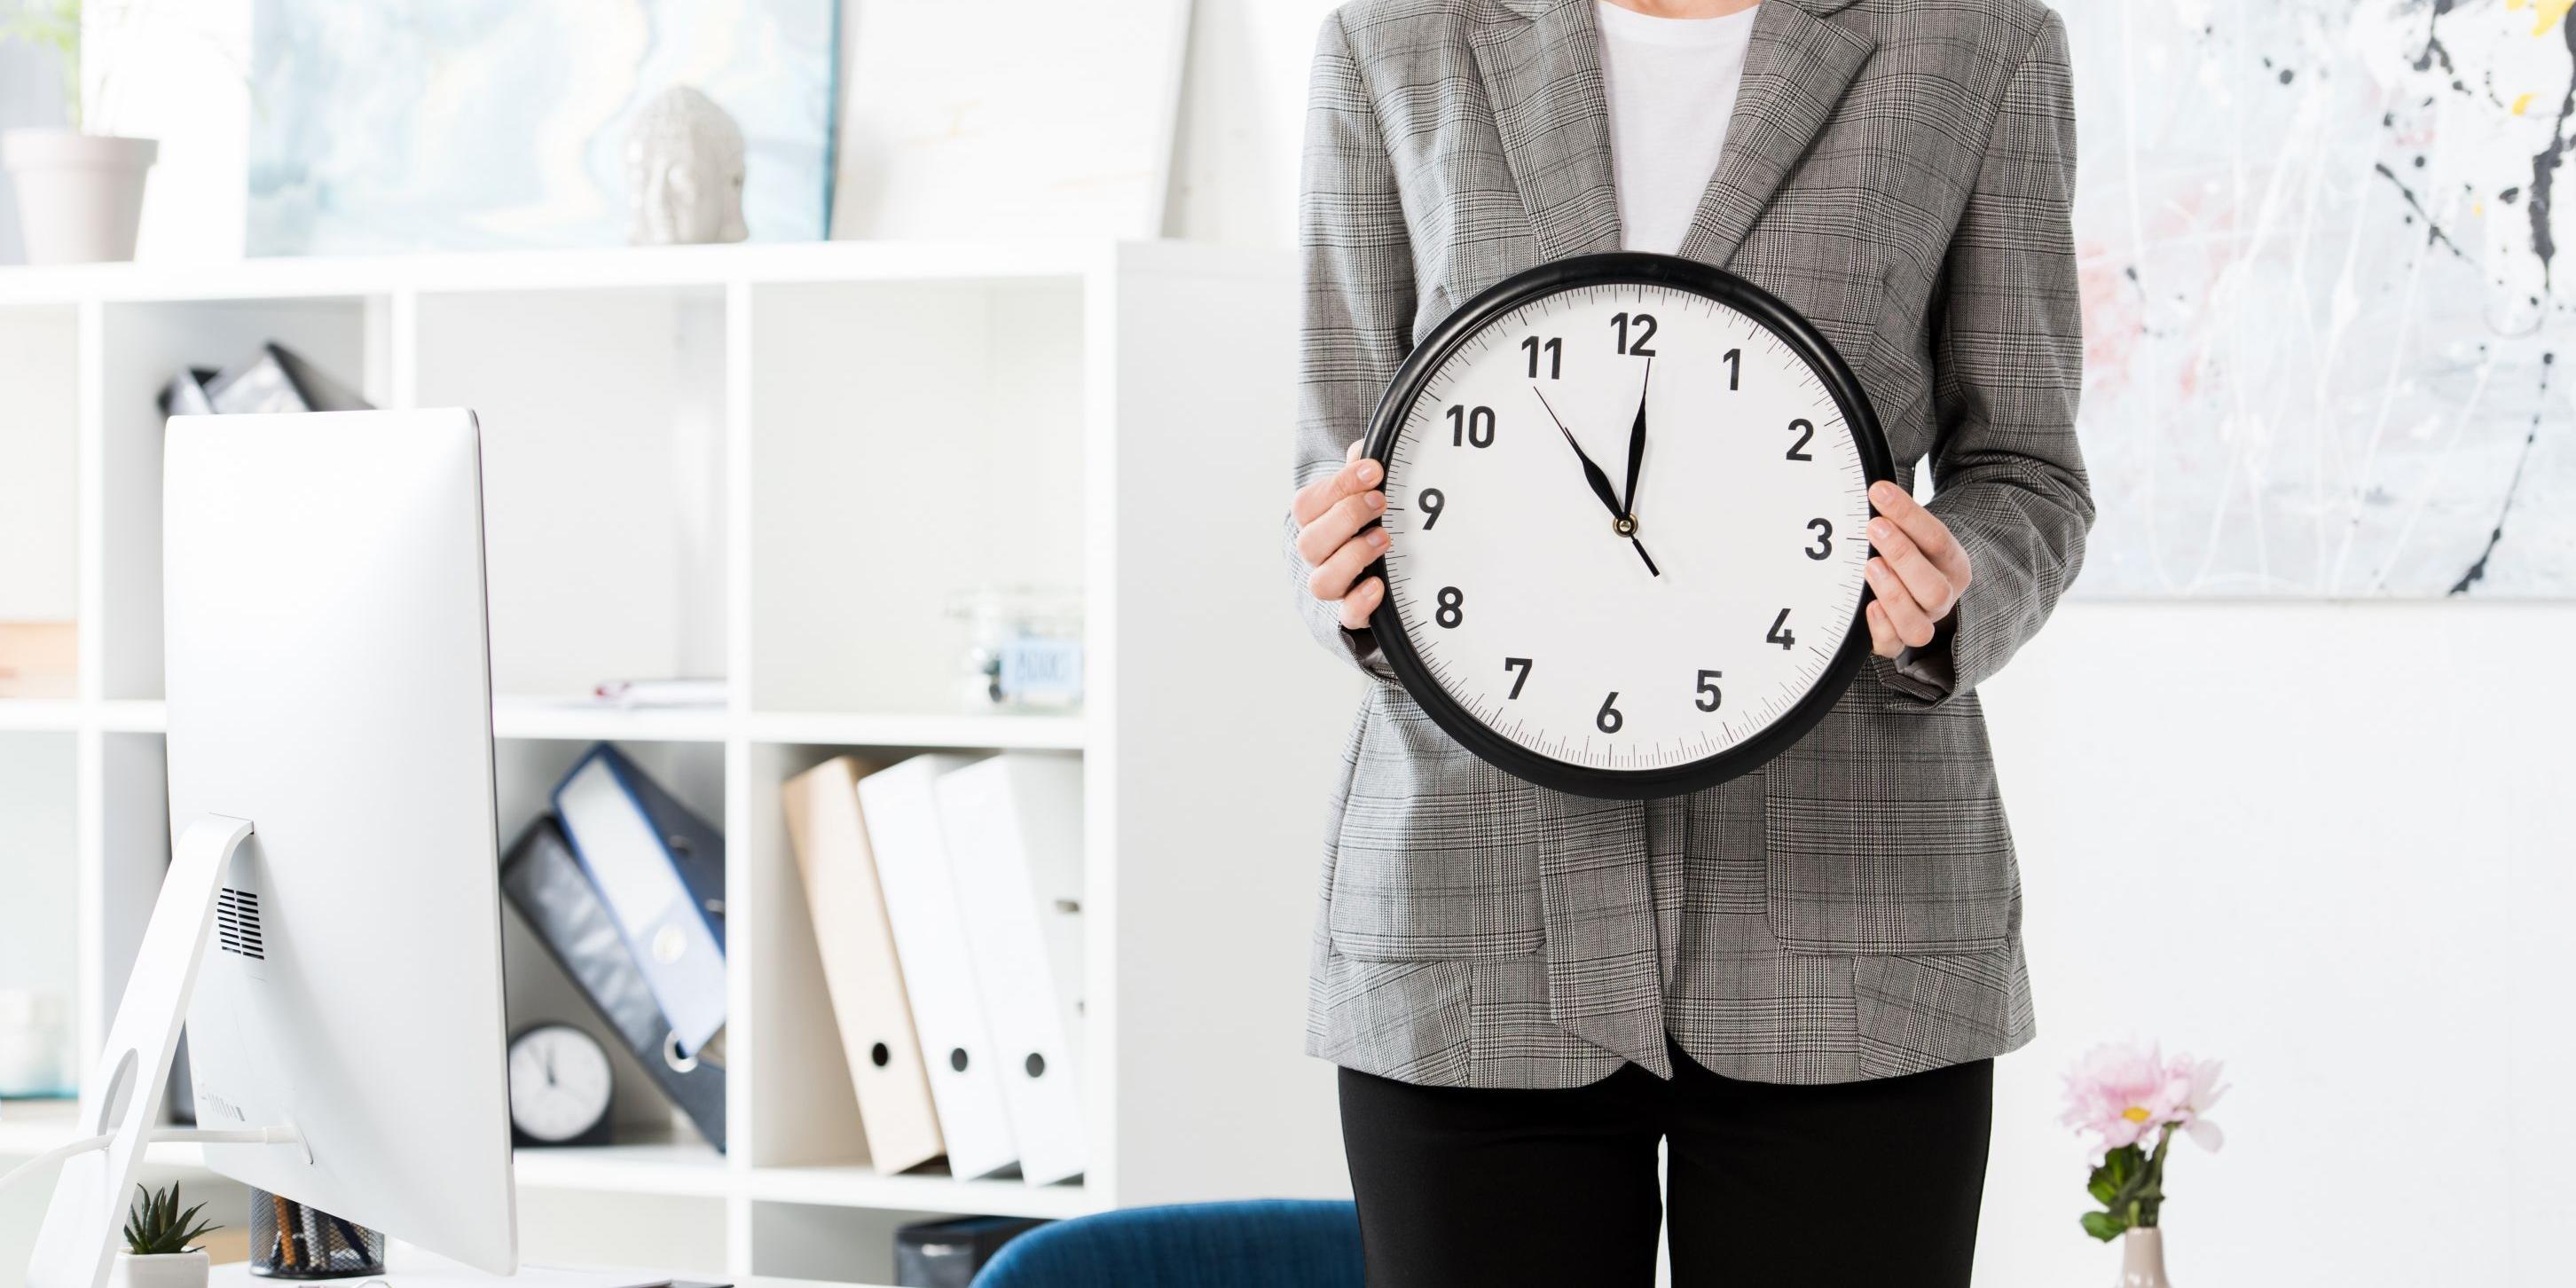 Mi Temps Therapeutique Conditions Demande Indemnisation